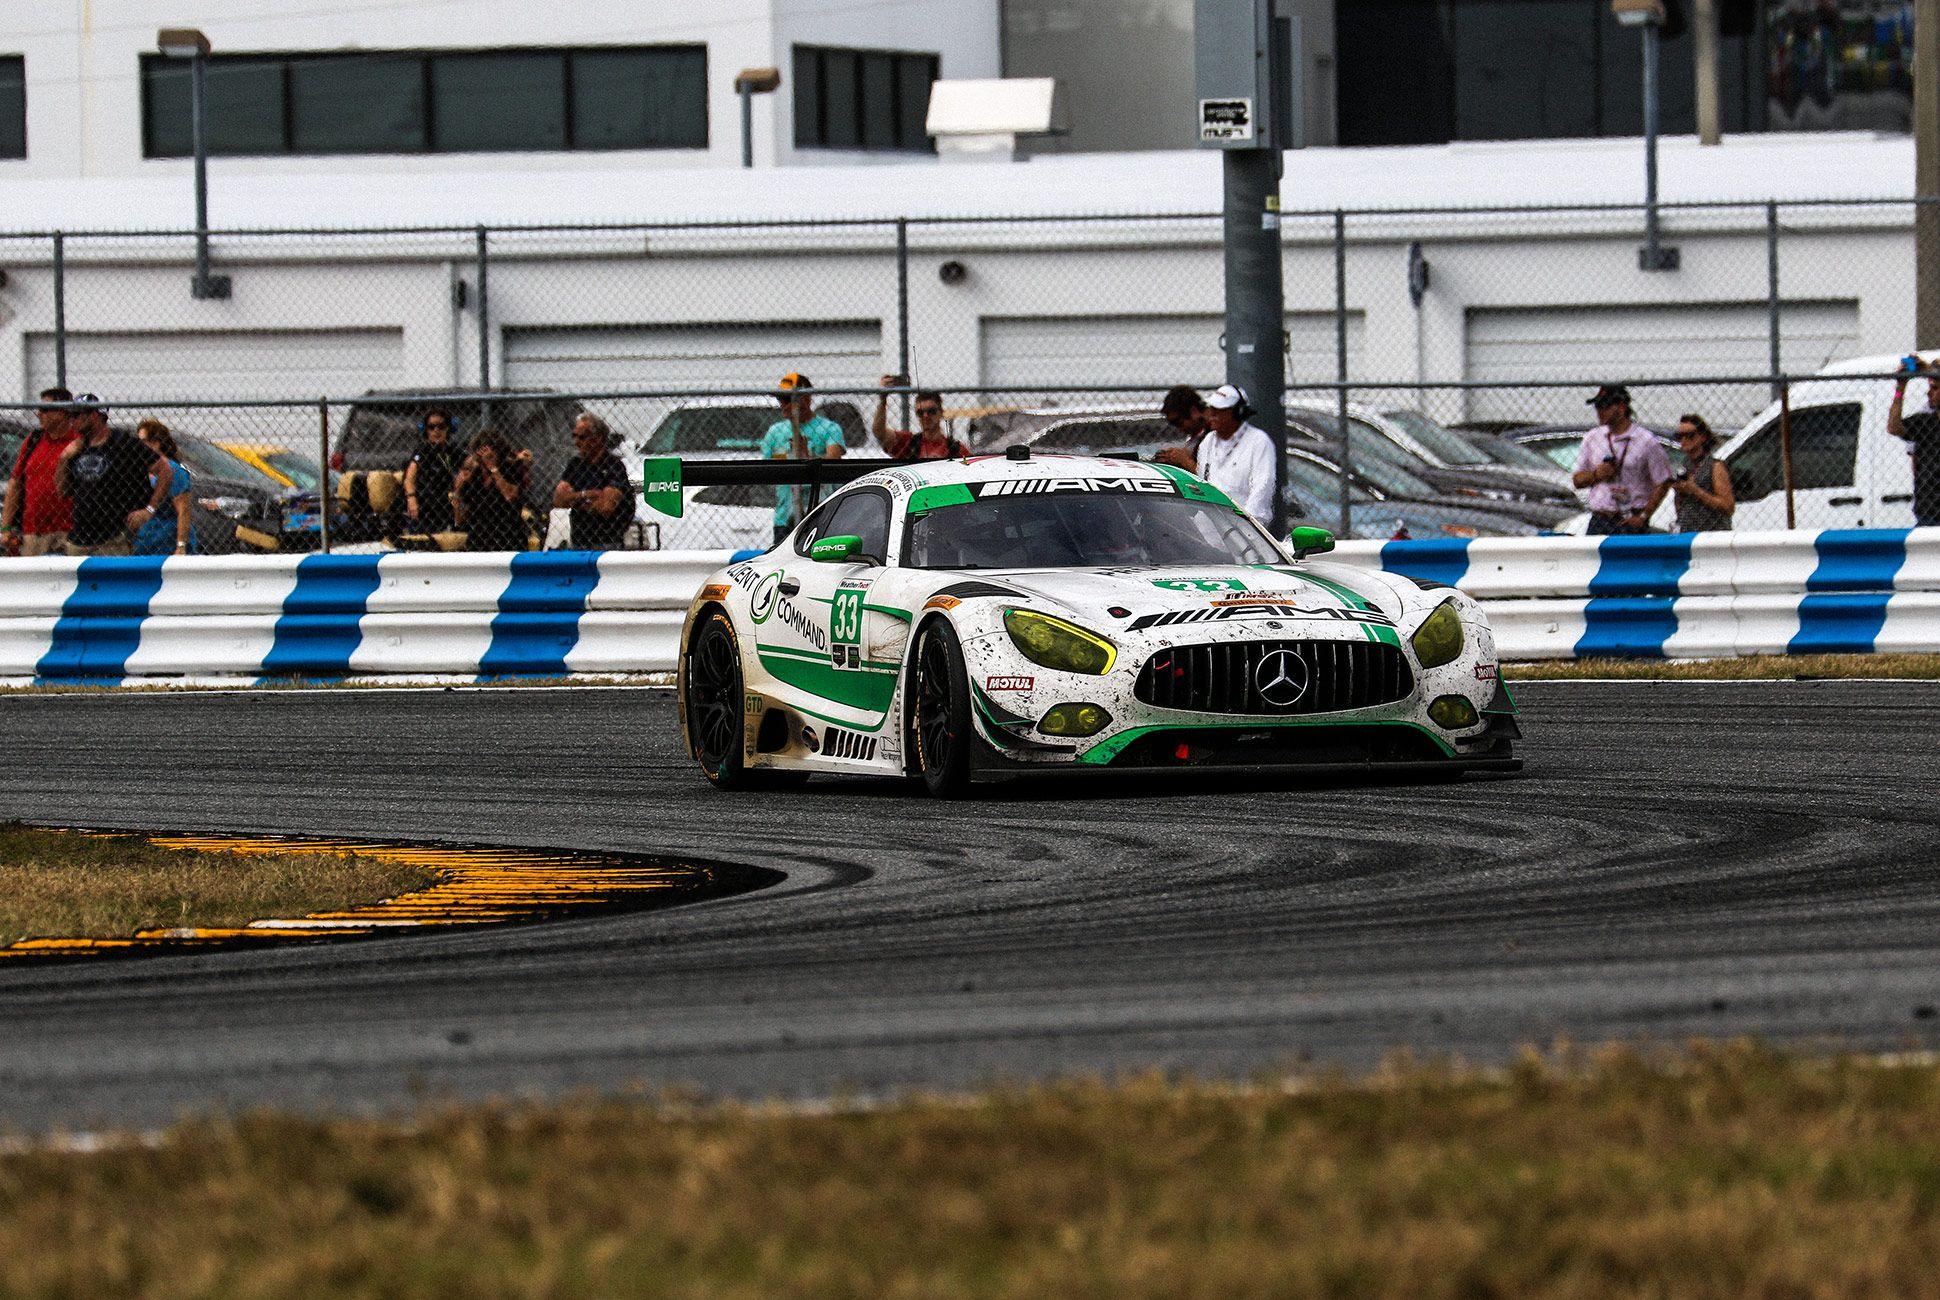 Best-Sports-Cars-of-2018-Daytona-24-Hours-gear-patrol-Mercedes-AMG-GT3-1